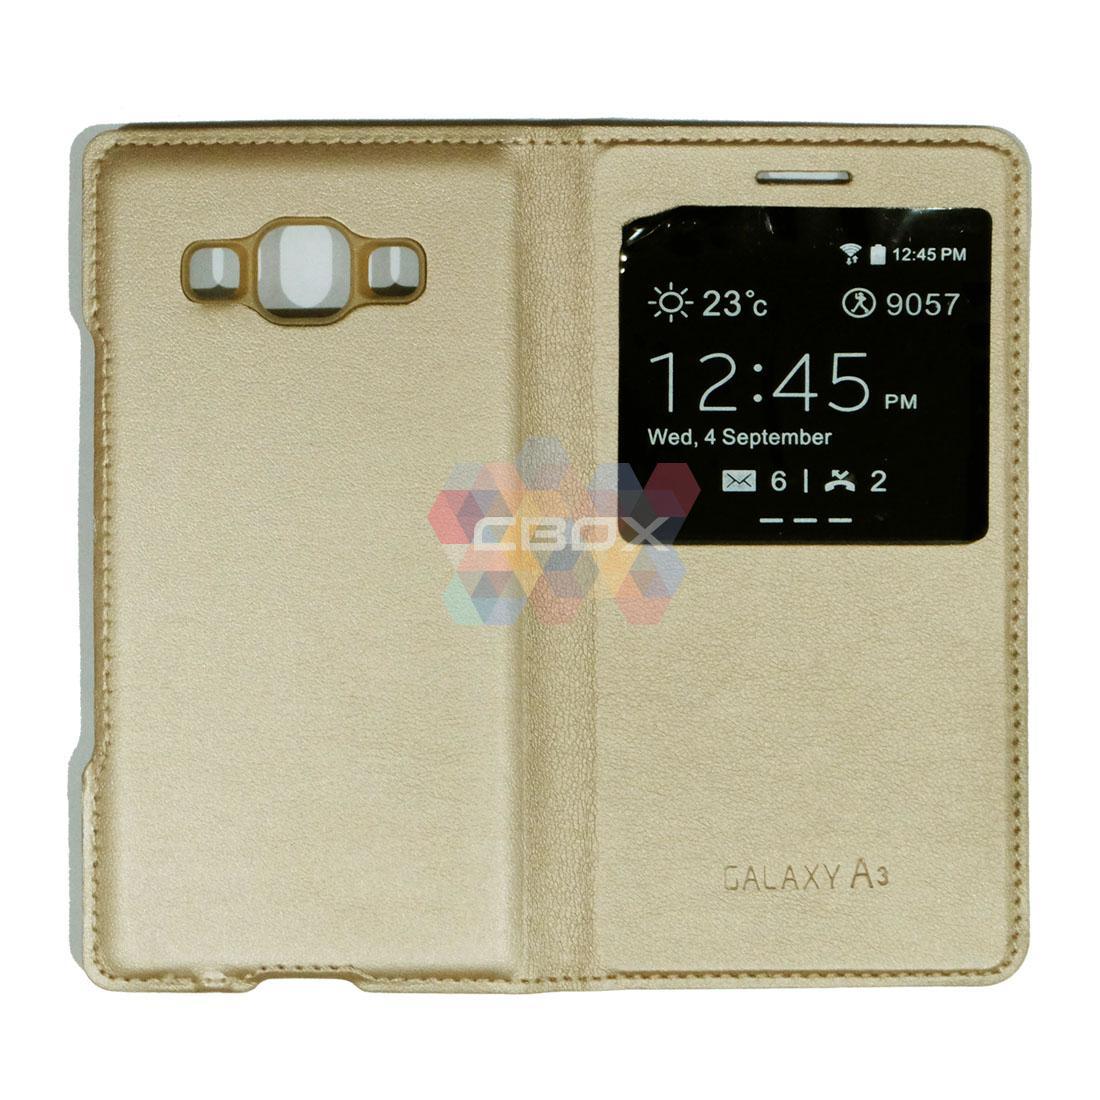 Galaxy Flipshell Samsung Galaxy A3 A300 / Smartcover Samsung Galaxy A3 / Leather Samsung Galaxy A3